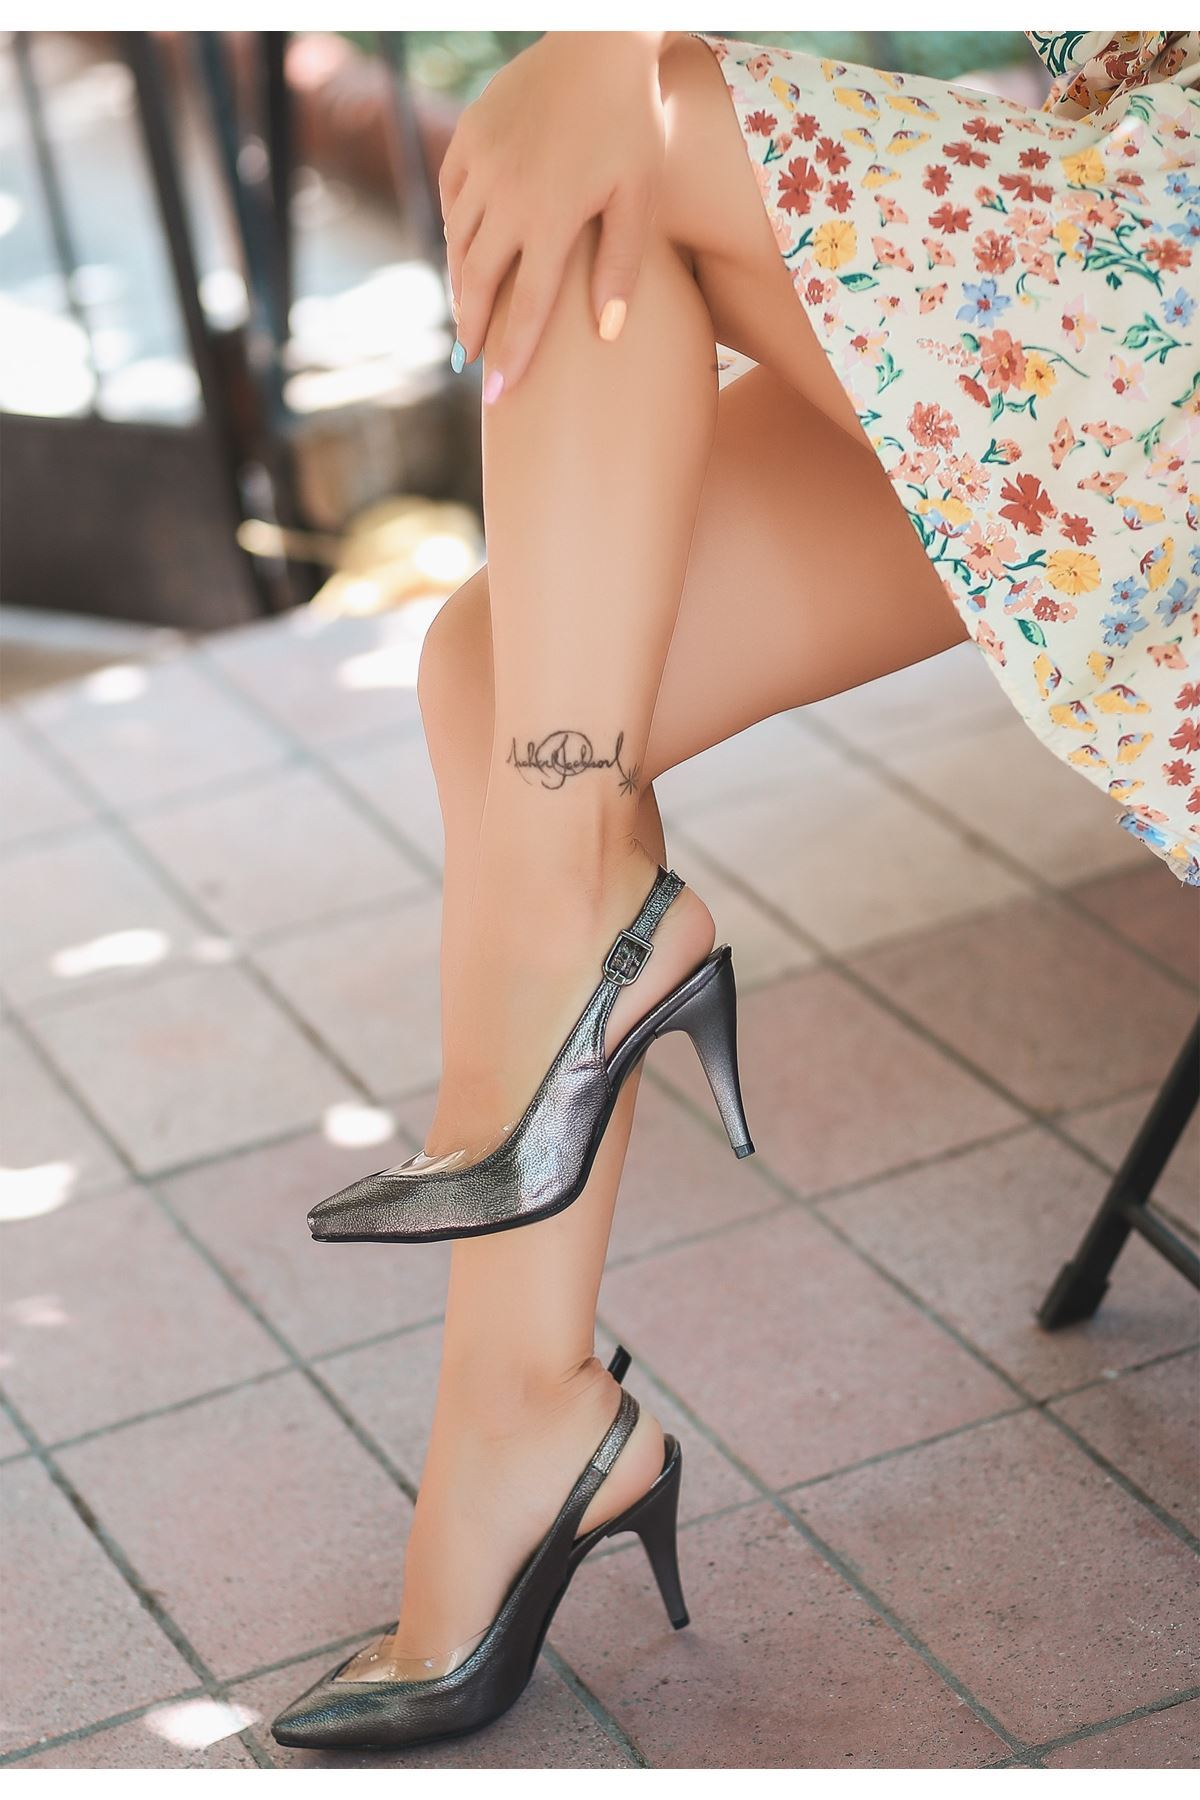 Jond Platin Cilt Desenli Topuklu Ayakkabı